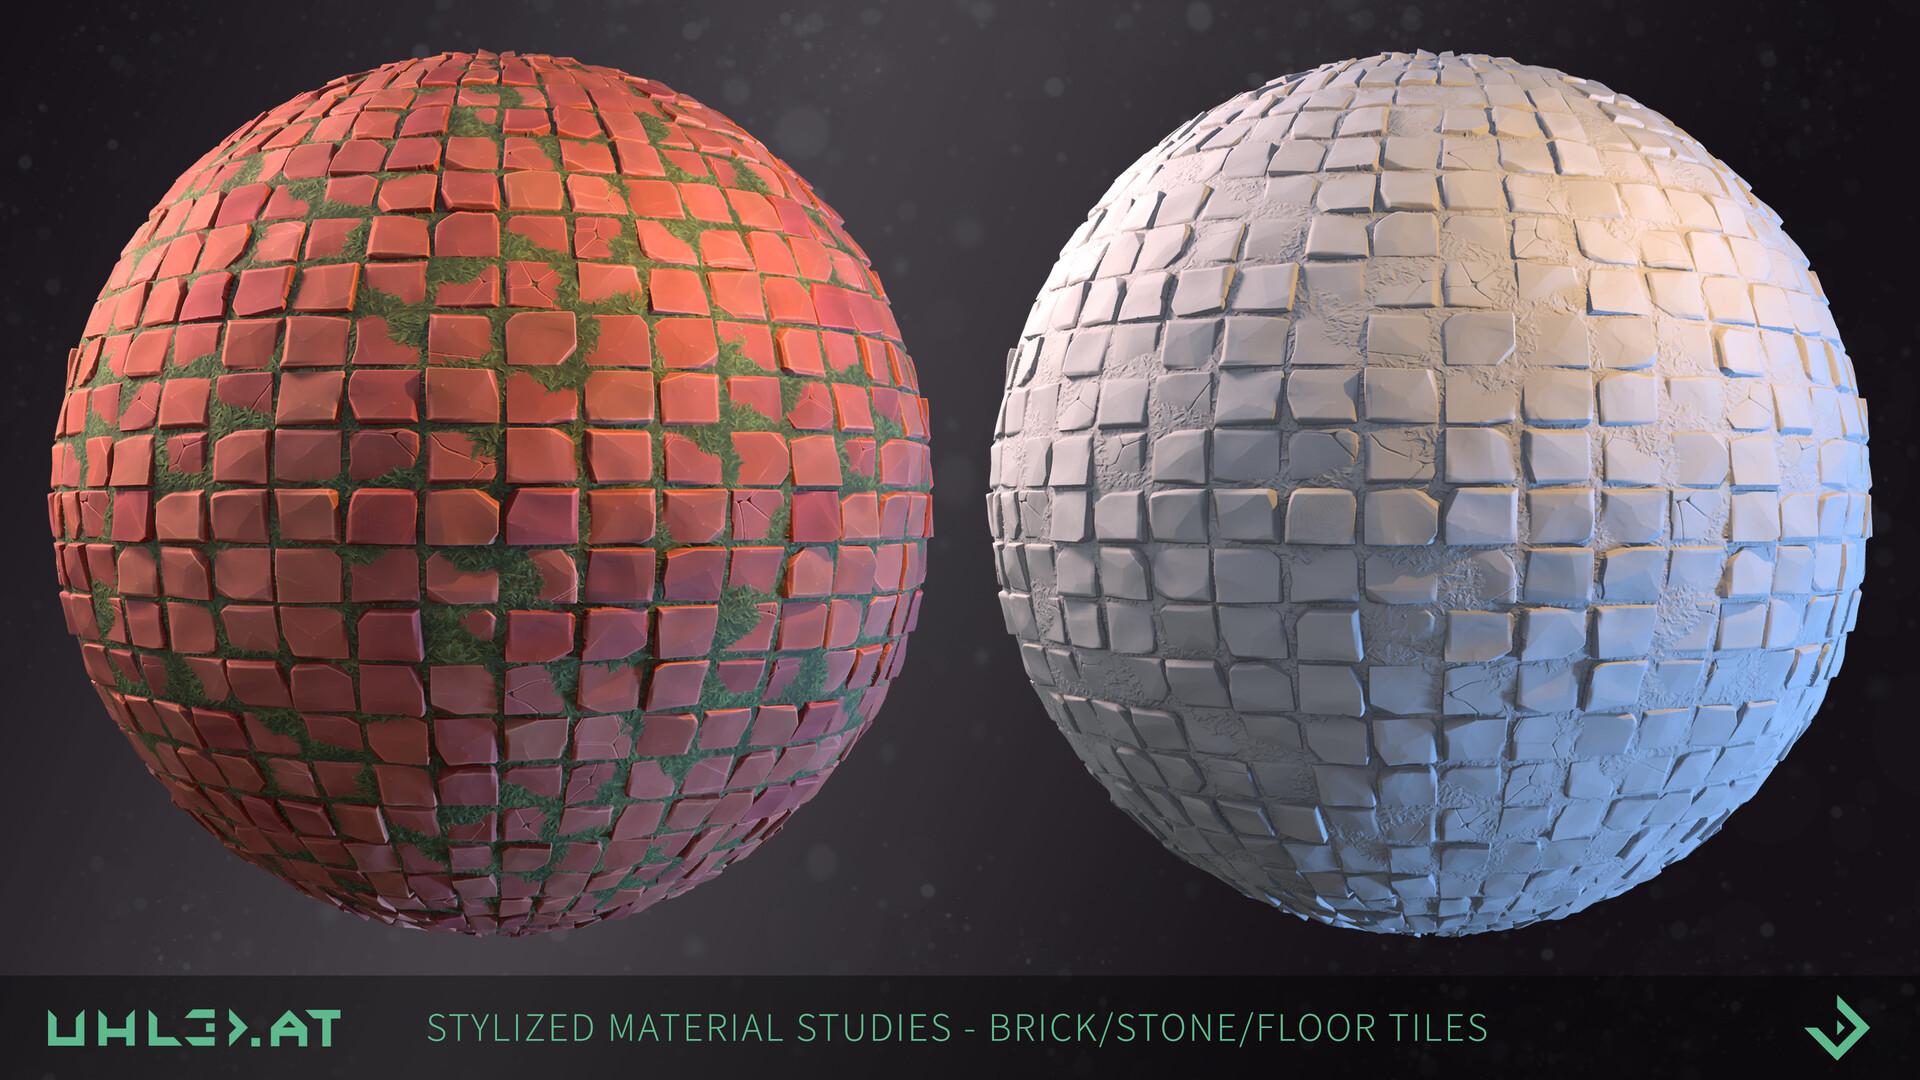 Dominik uhl stylized brick stone studies 04